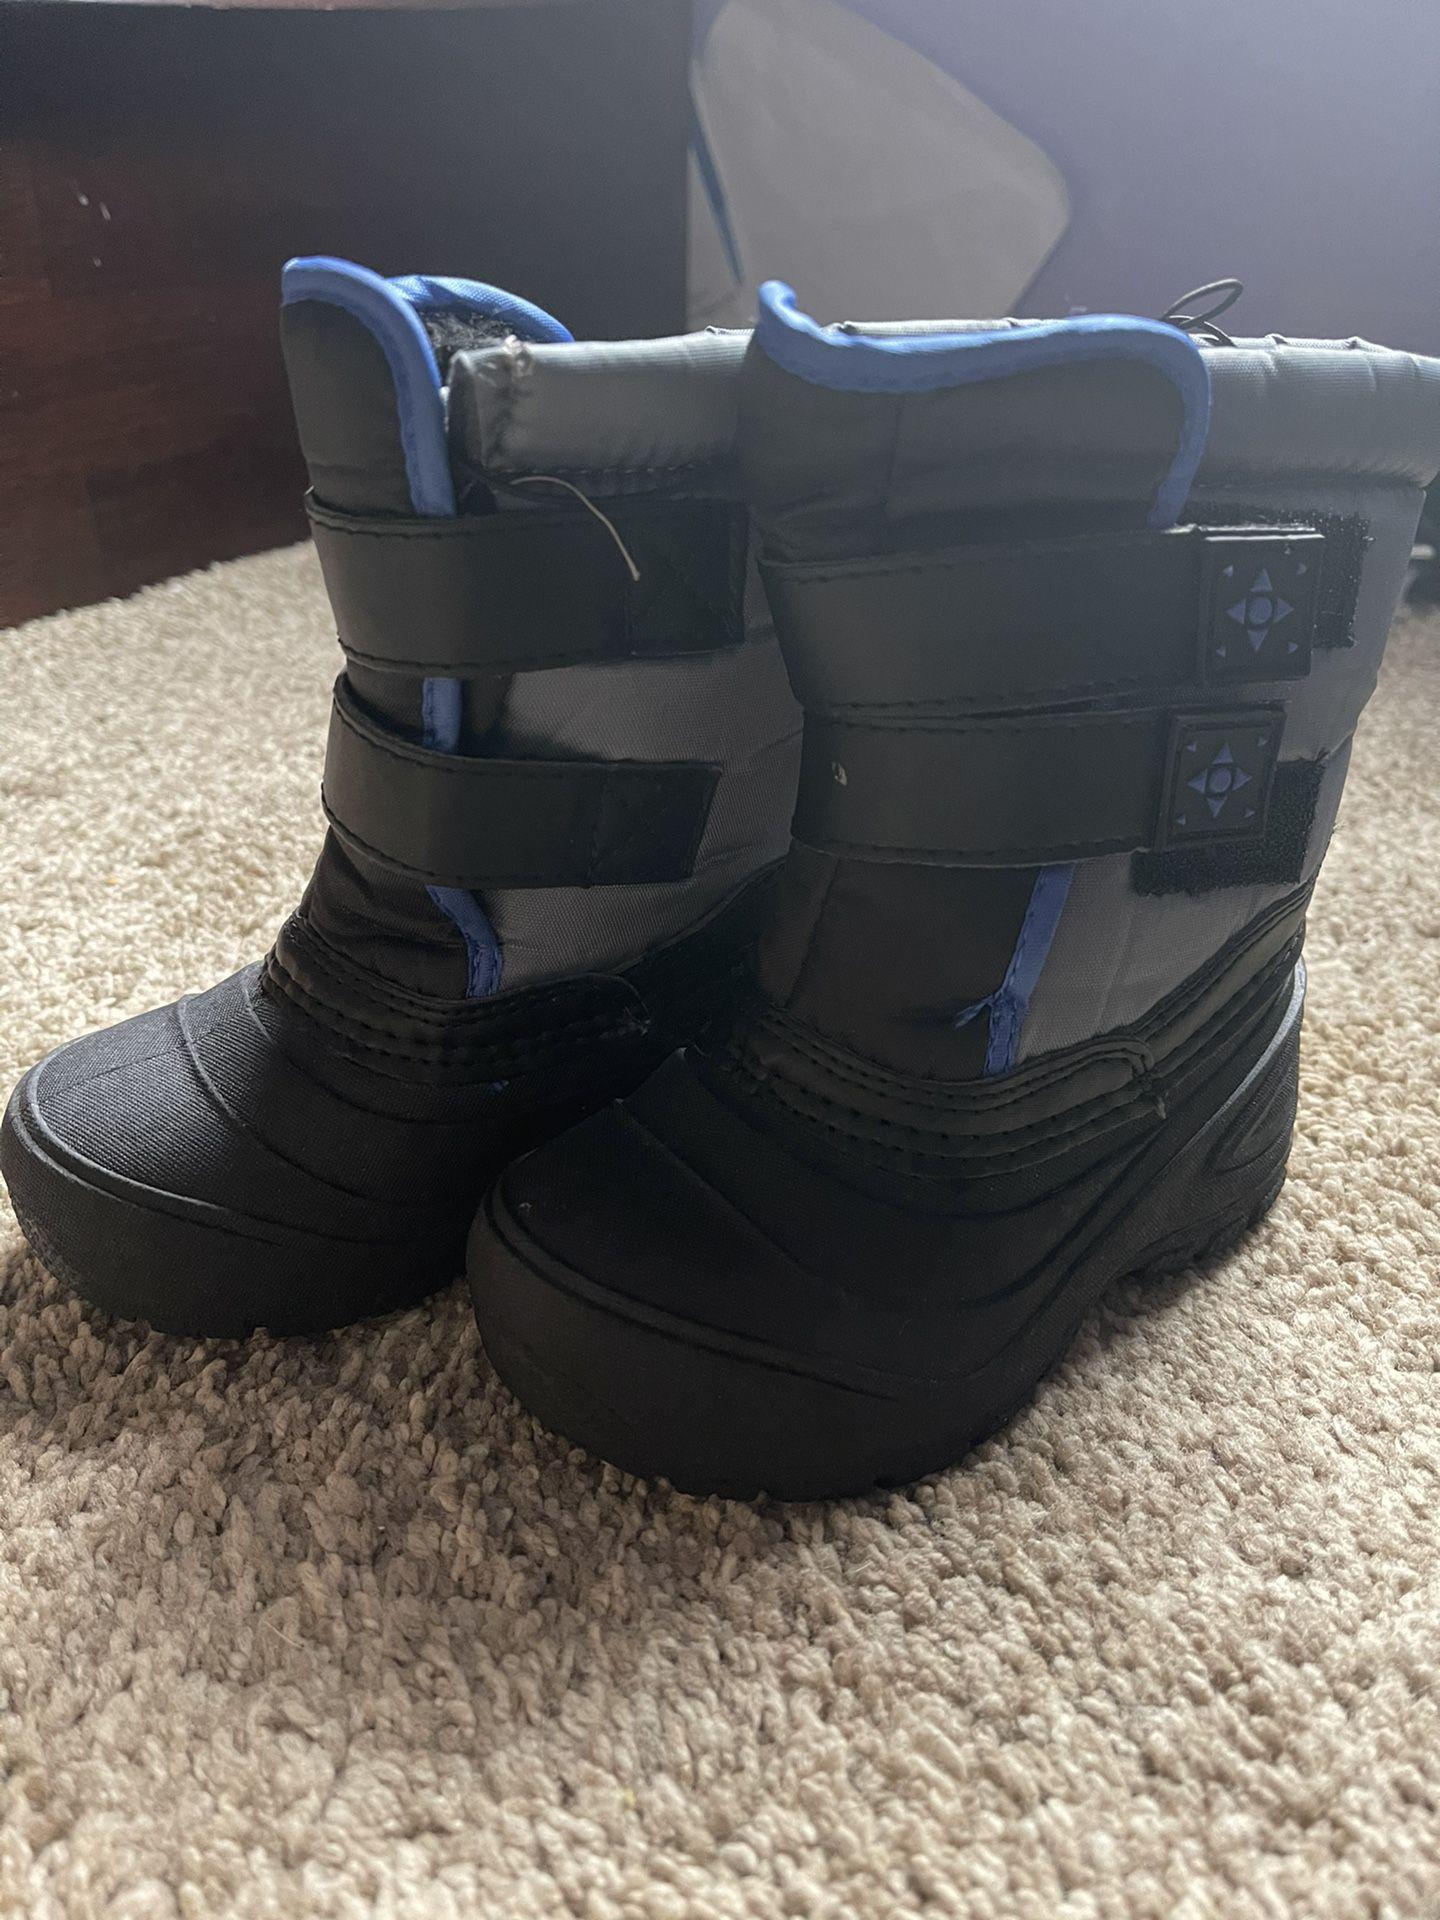 Toddler Boots (boy)